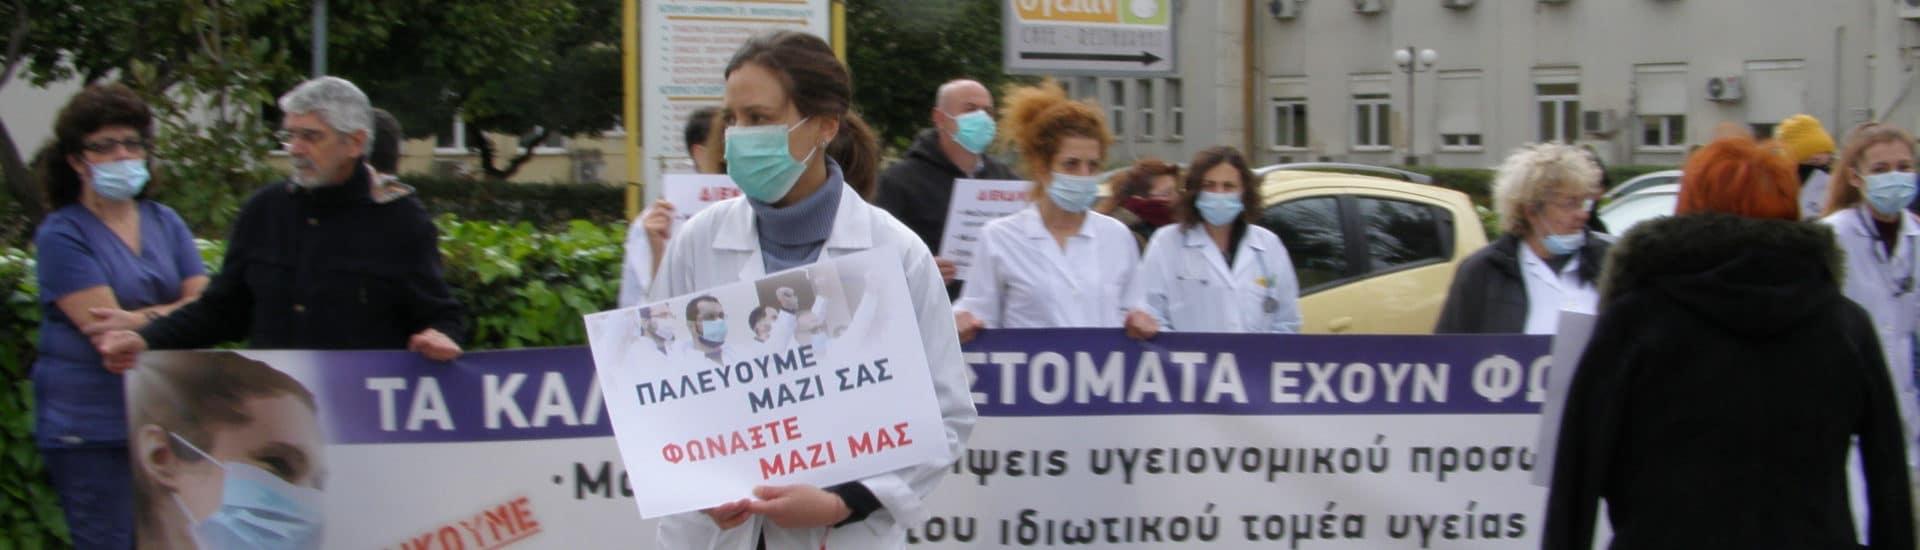 Mαζική διαδήλωση στο Γενικό Kρατικό Nικαίας (videos+photos)